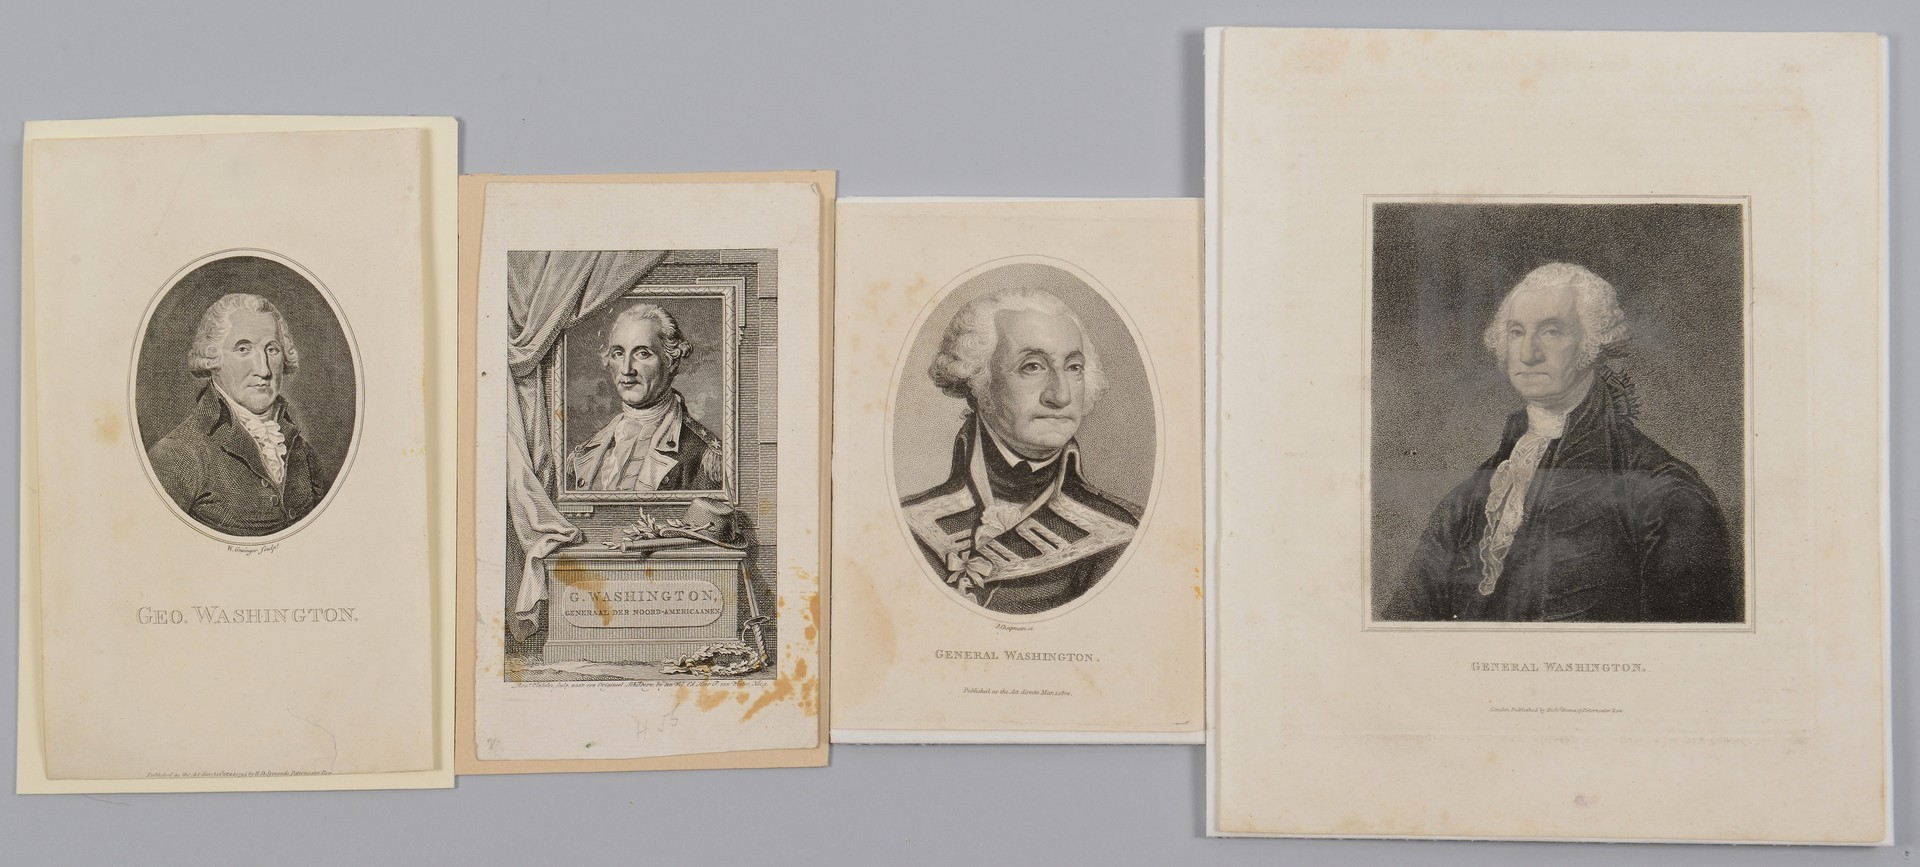 Lot 563: 4 George Washington Engraved Portraits